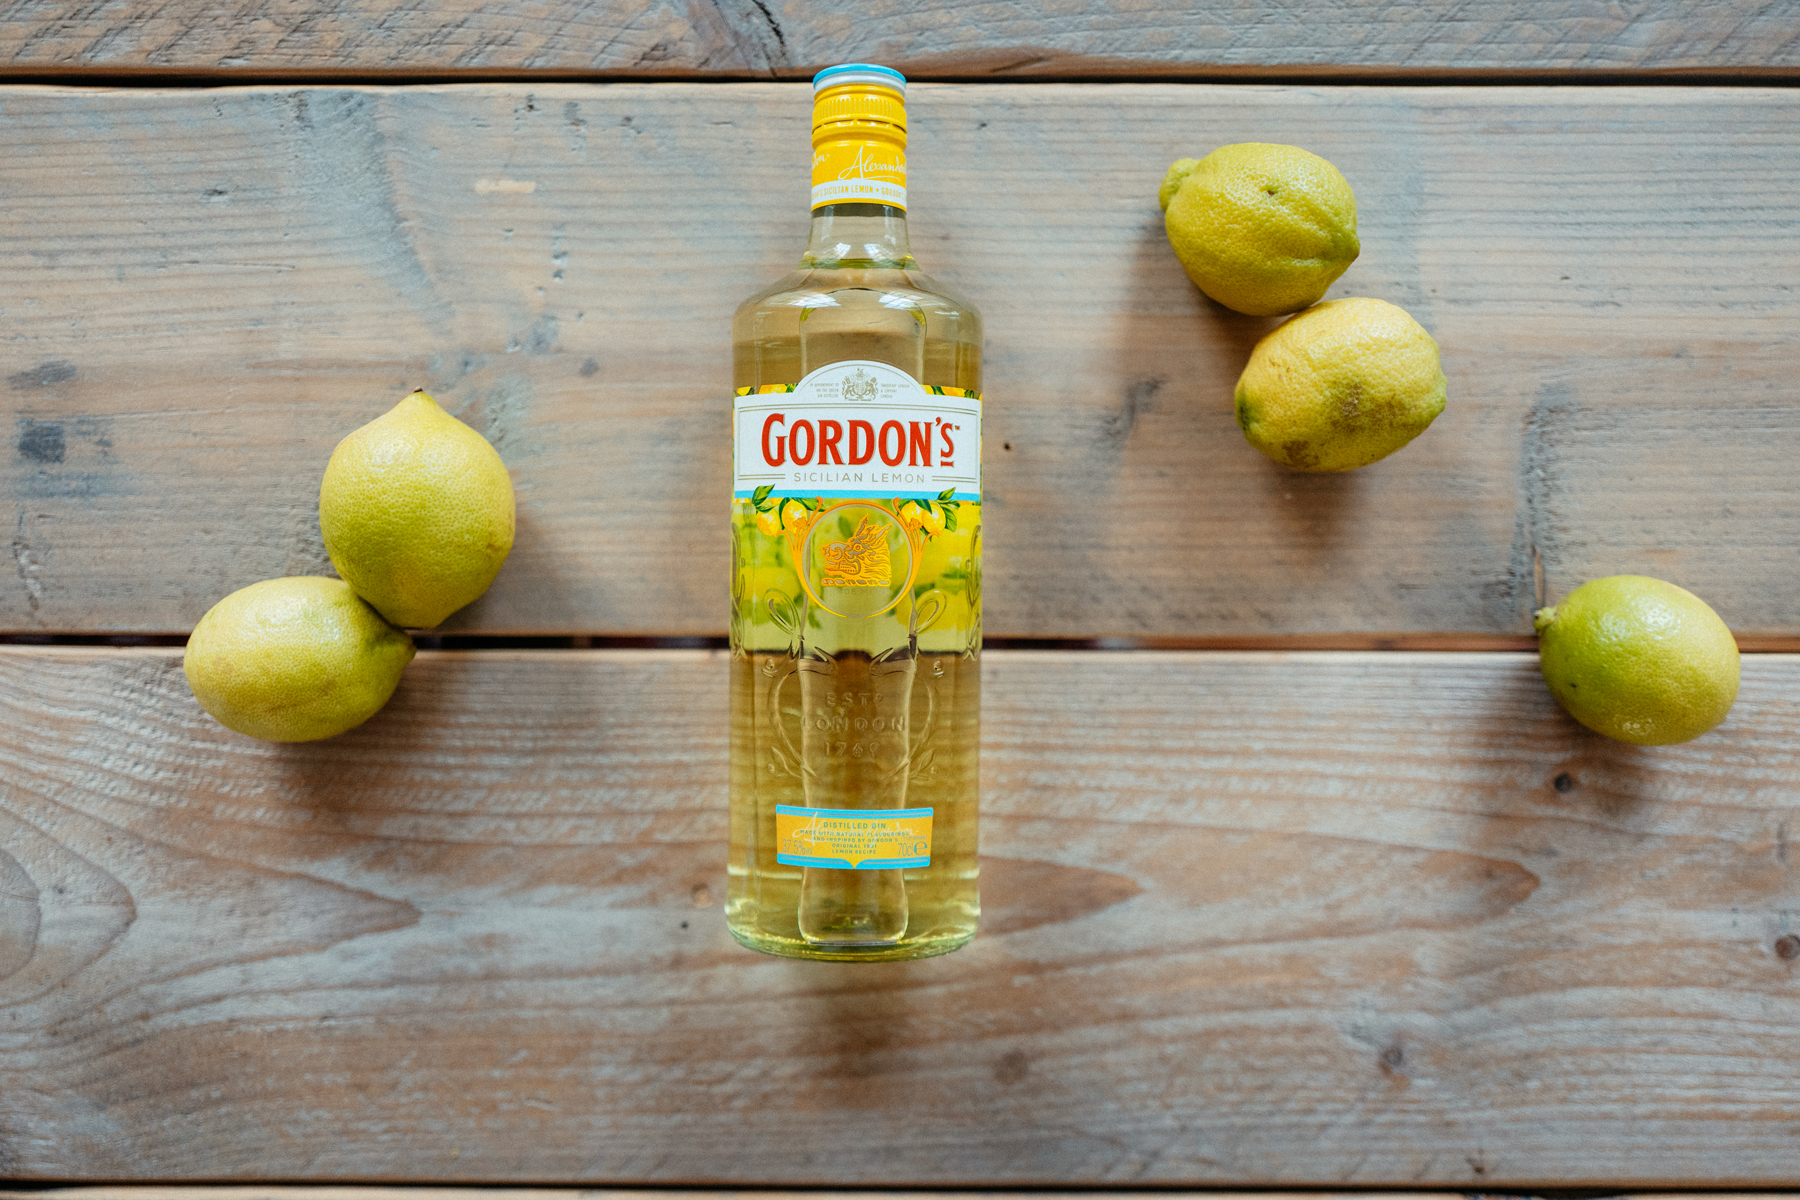 Geheimtipp Hamburg Gordons Gin Sicilian Lemon Dahlina Sophie Kock 008